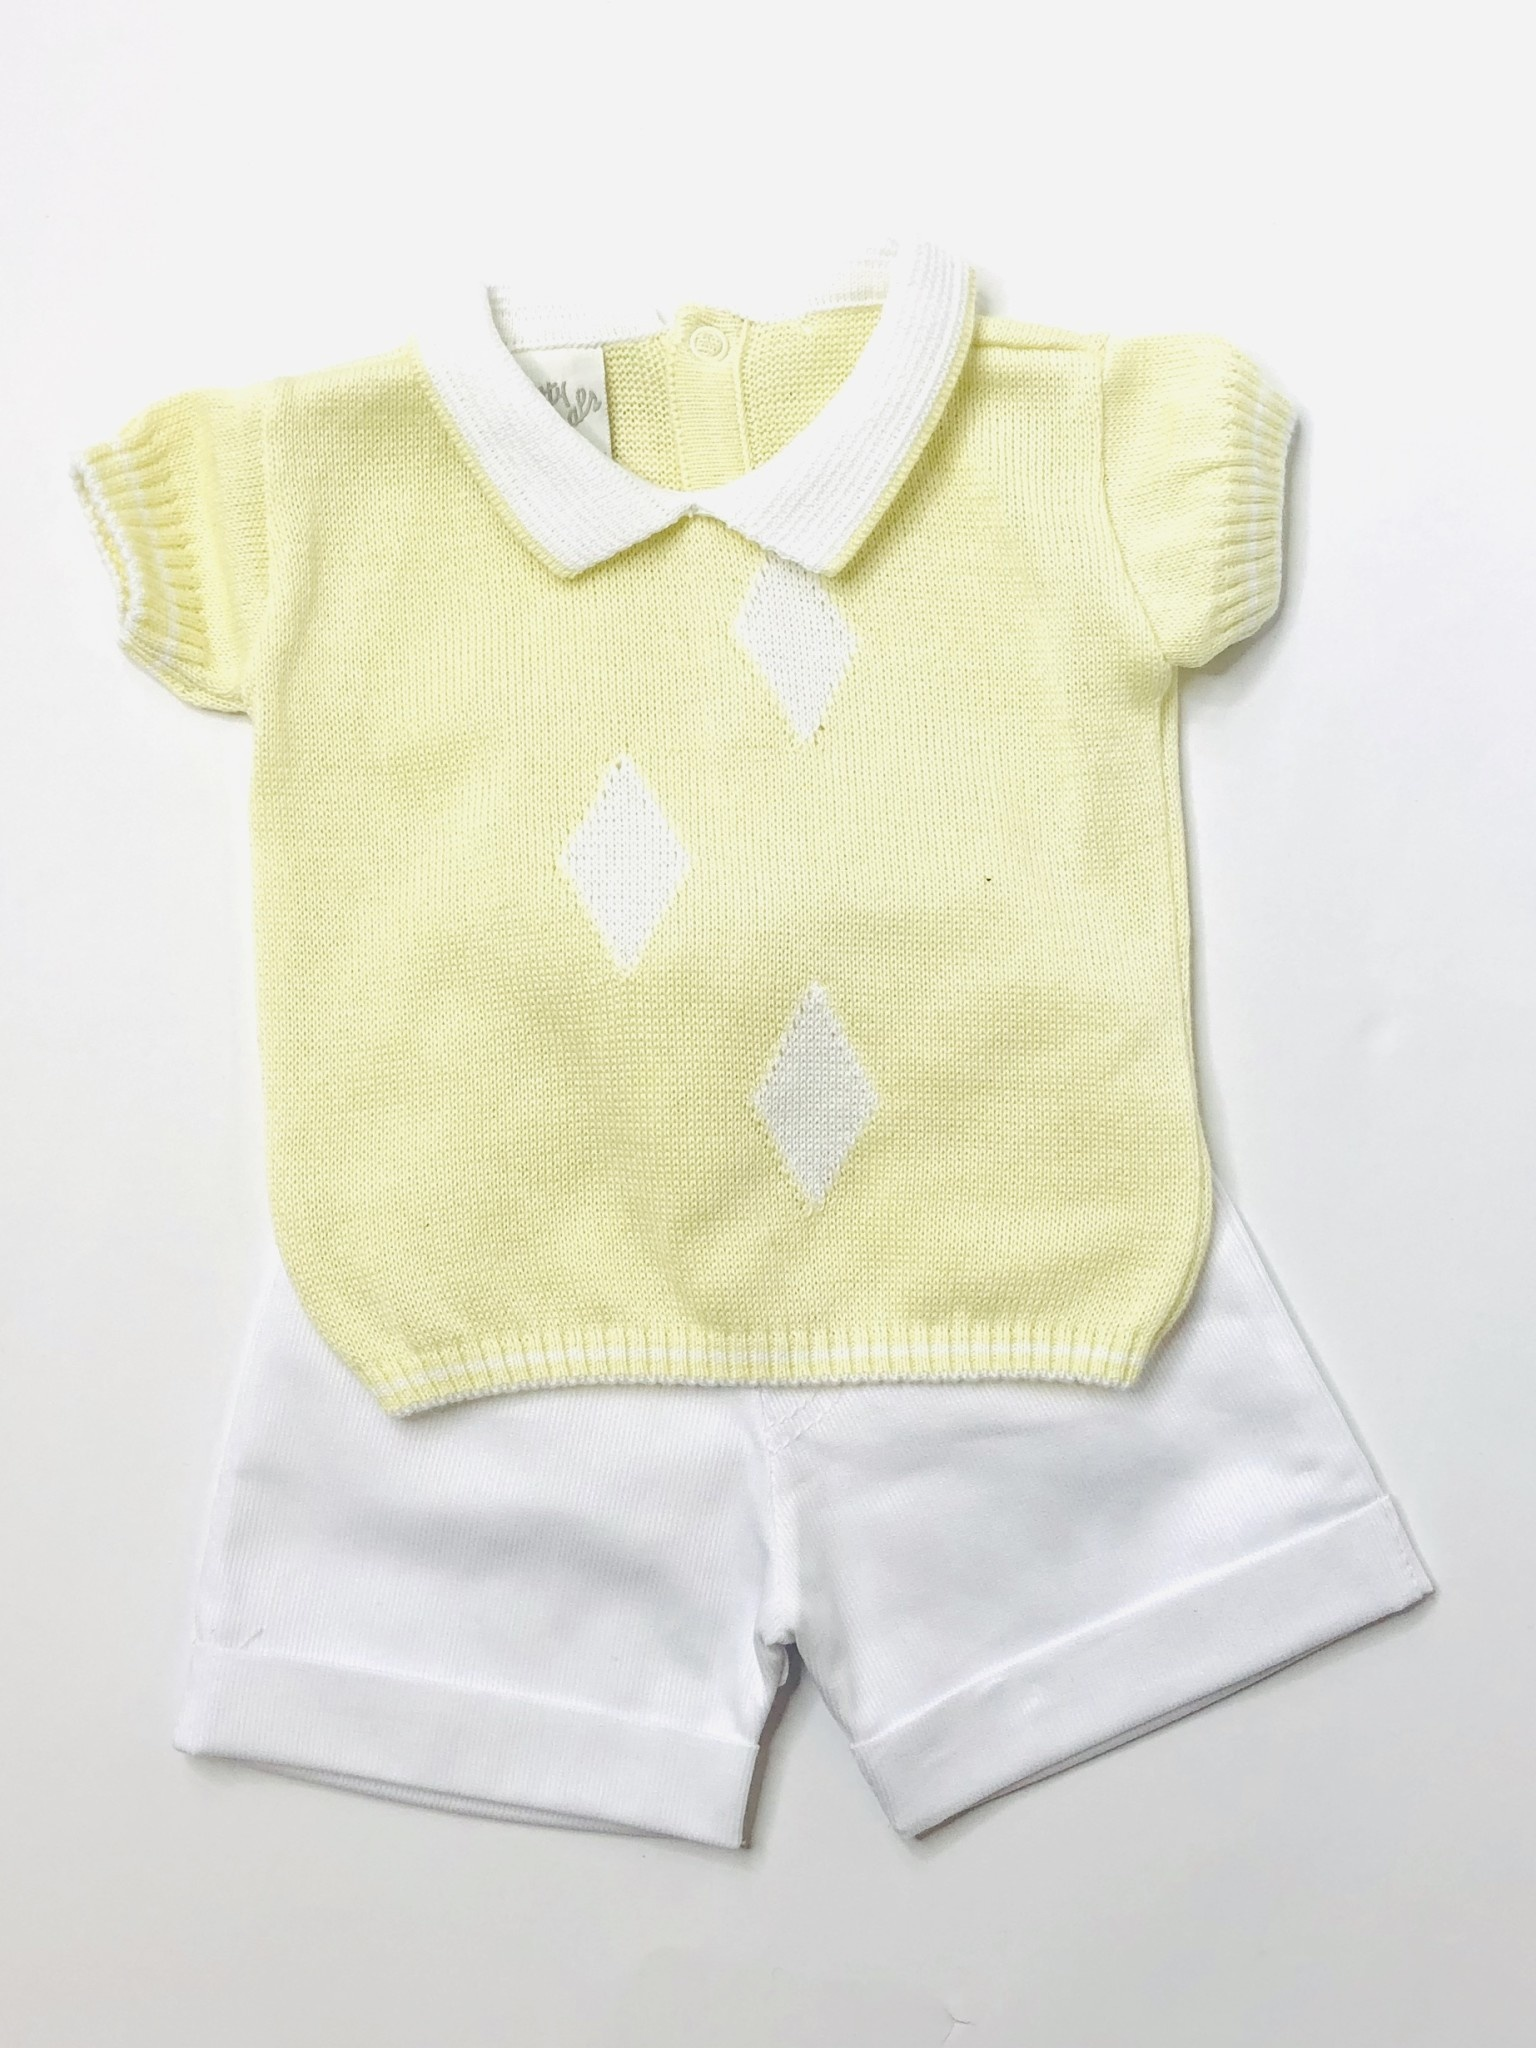 Pretty Originals Pretty Originals Yellow Knit Top & Short, Diamond Shape detai